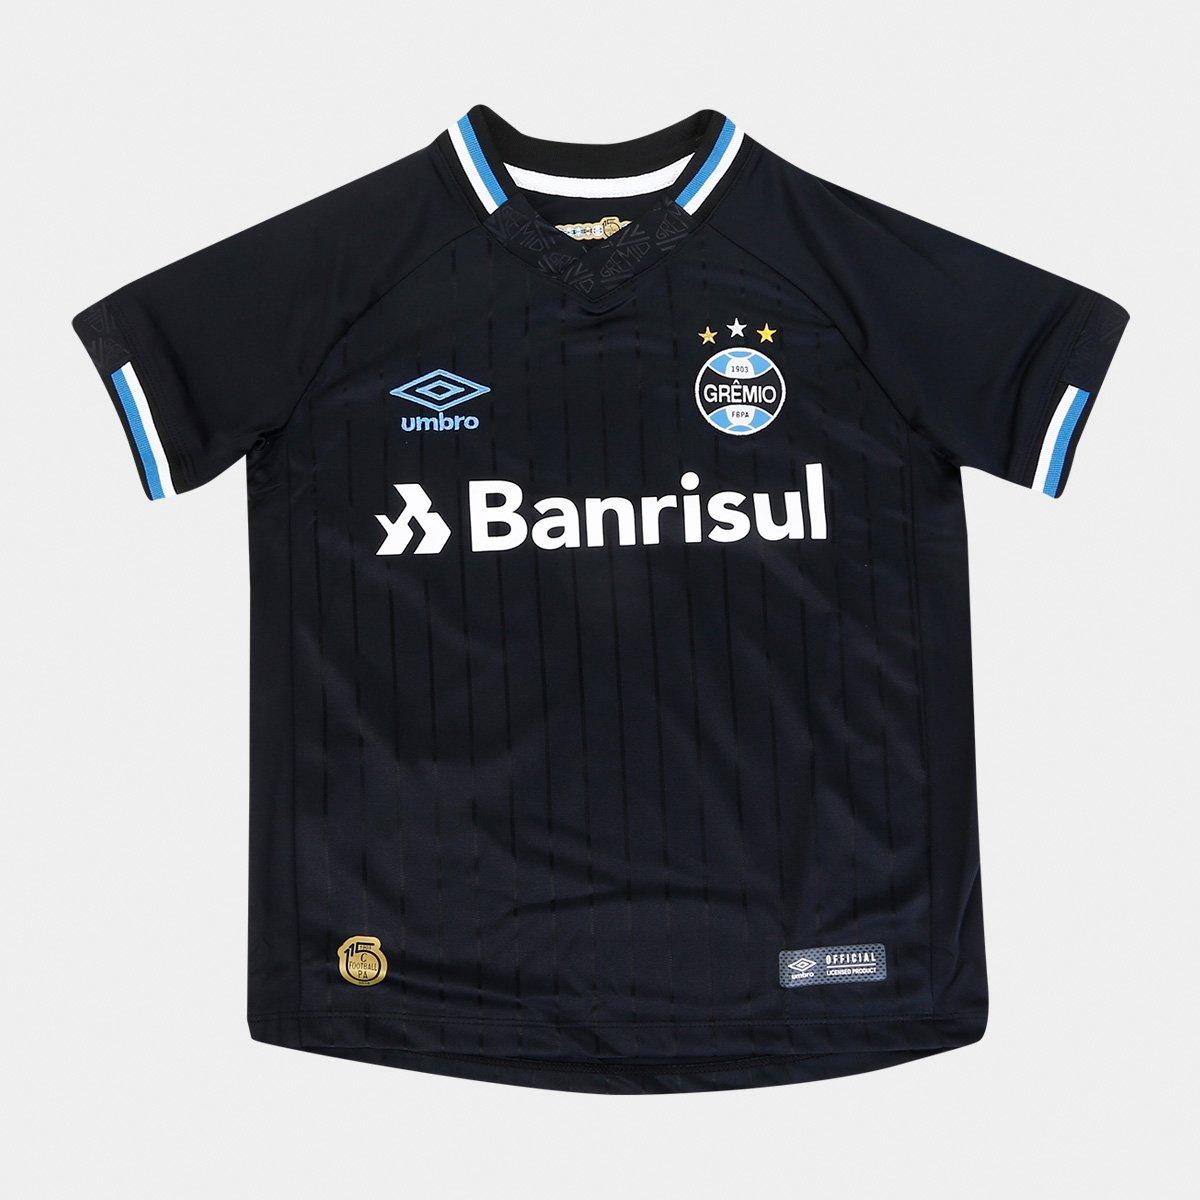 Camisa Grêmio III 2018 s n° Torcedor Umbro Infantil ae11fd3f4fae7